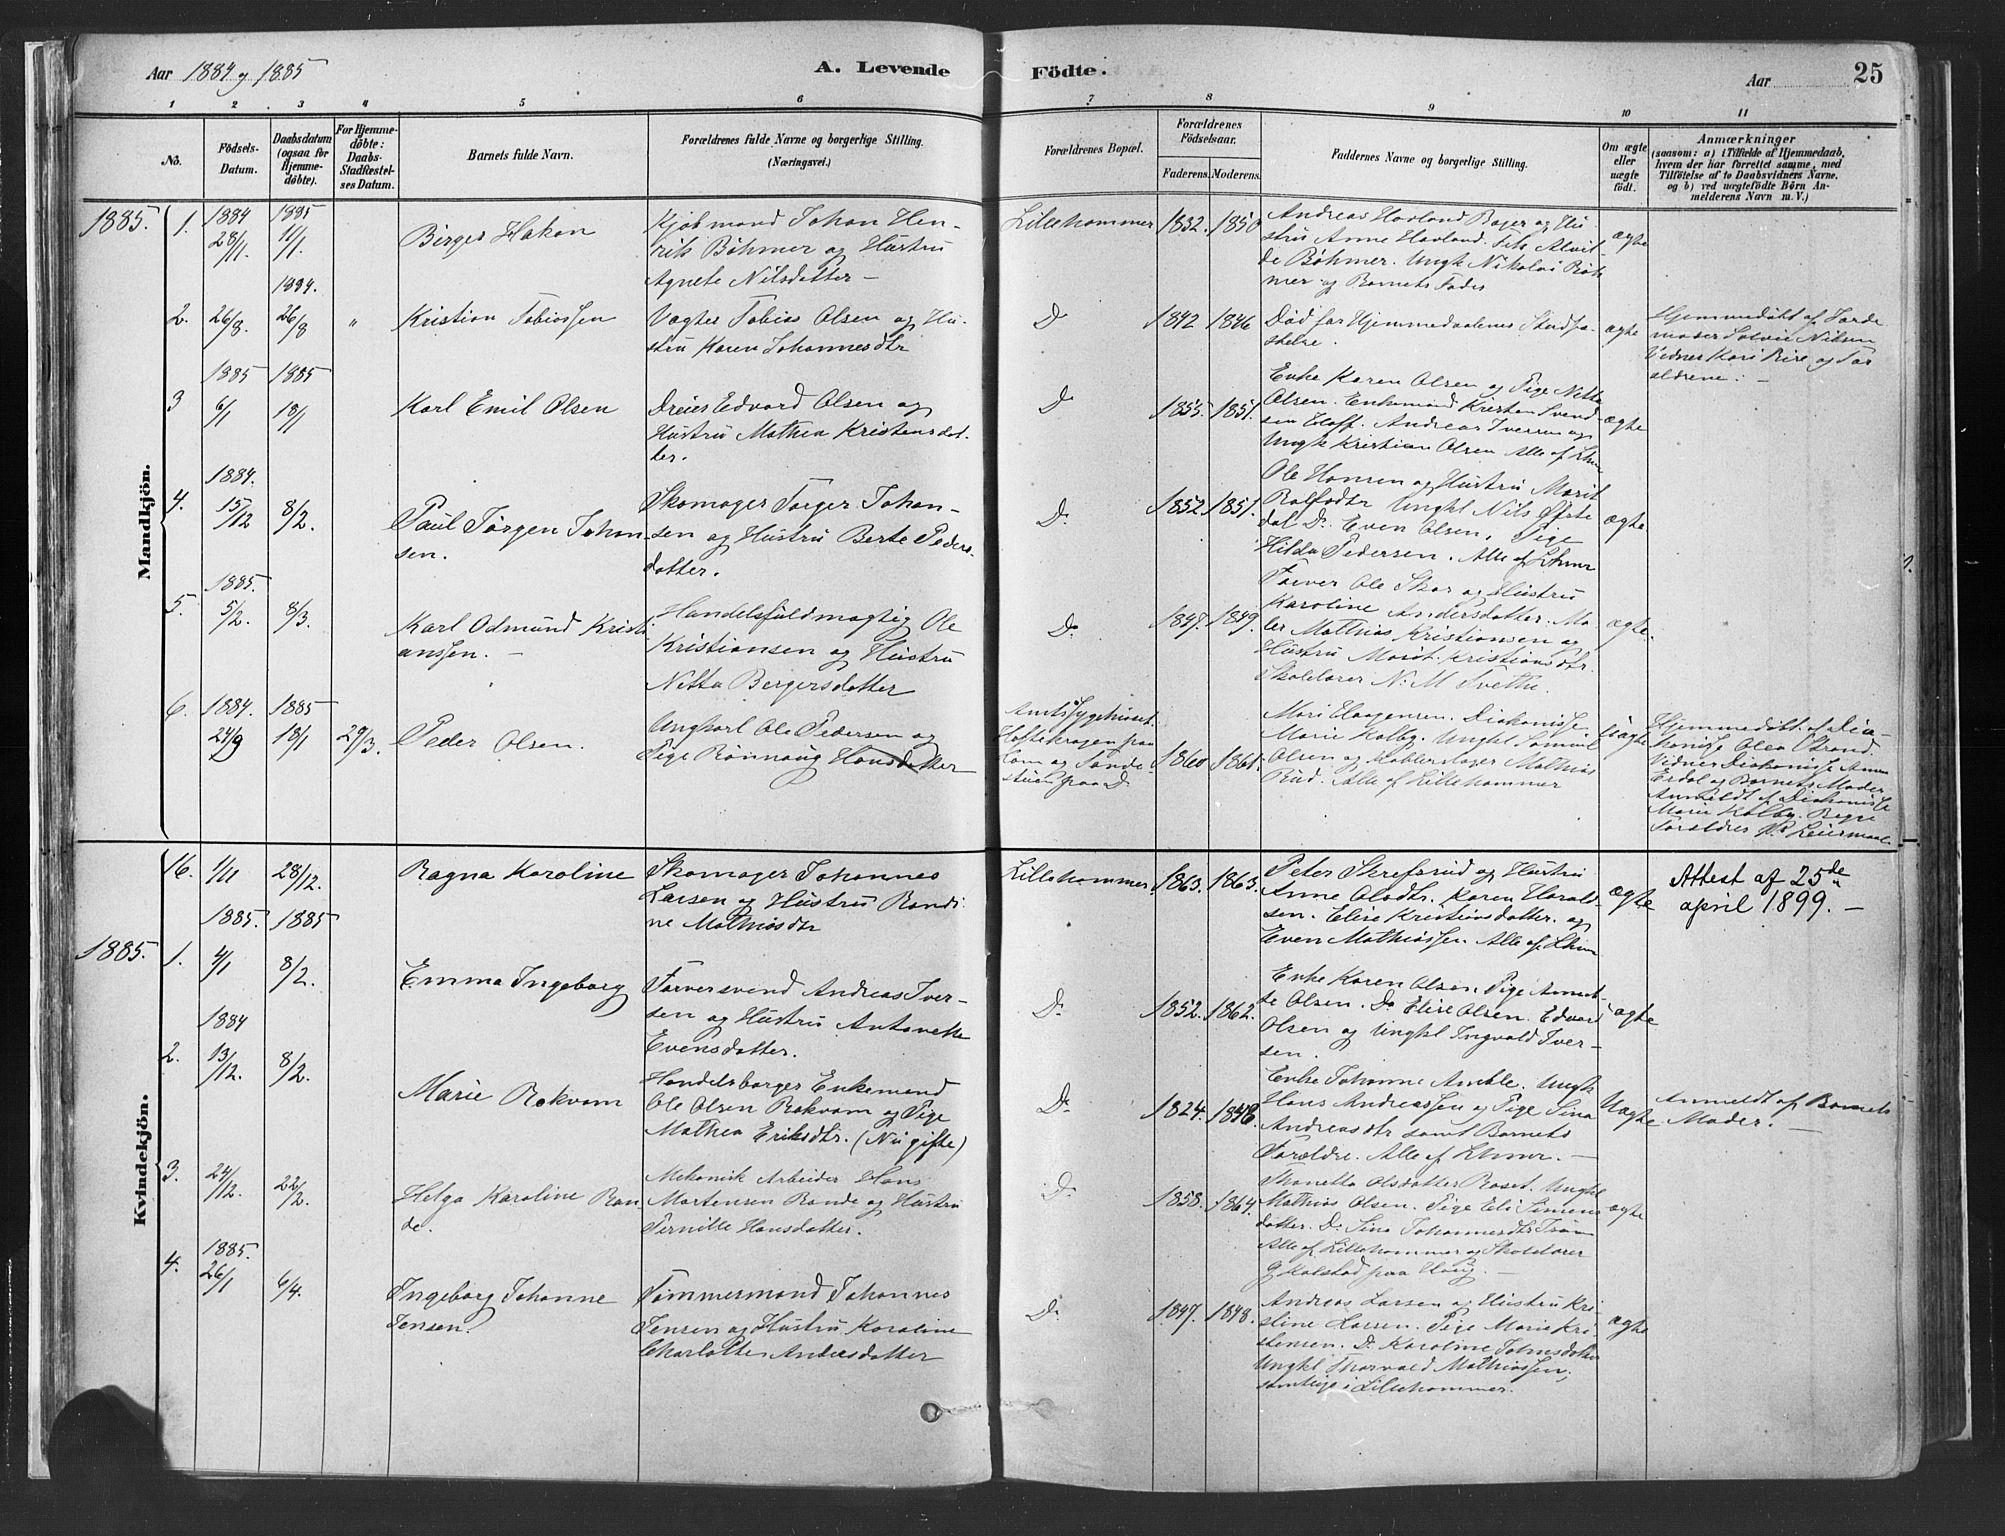 SAH, Fåberg prestekontor, Ministerialbok nr. 10, 1879-1900, s. 25